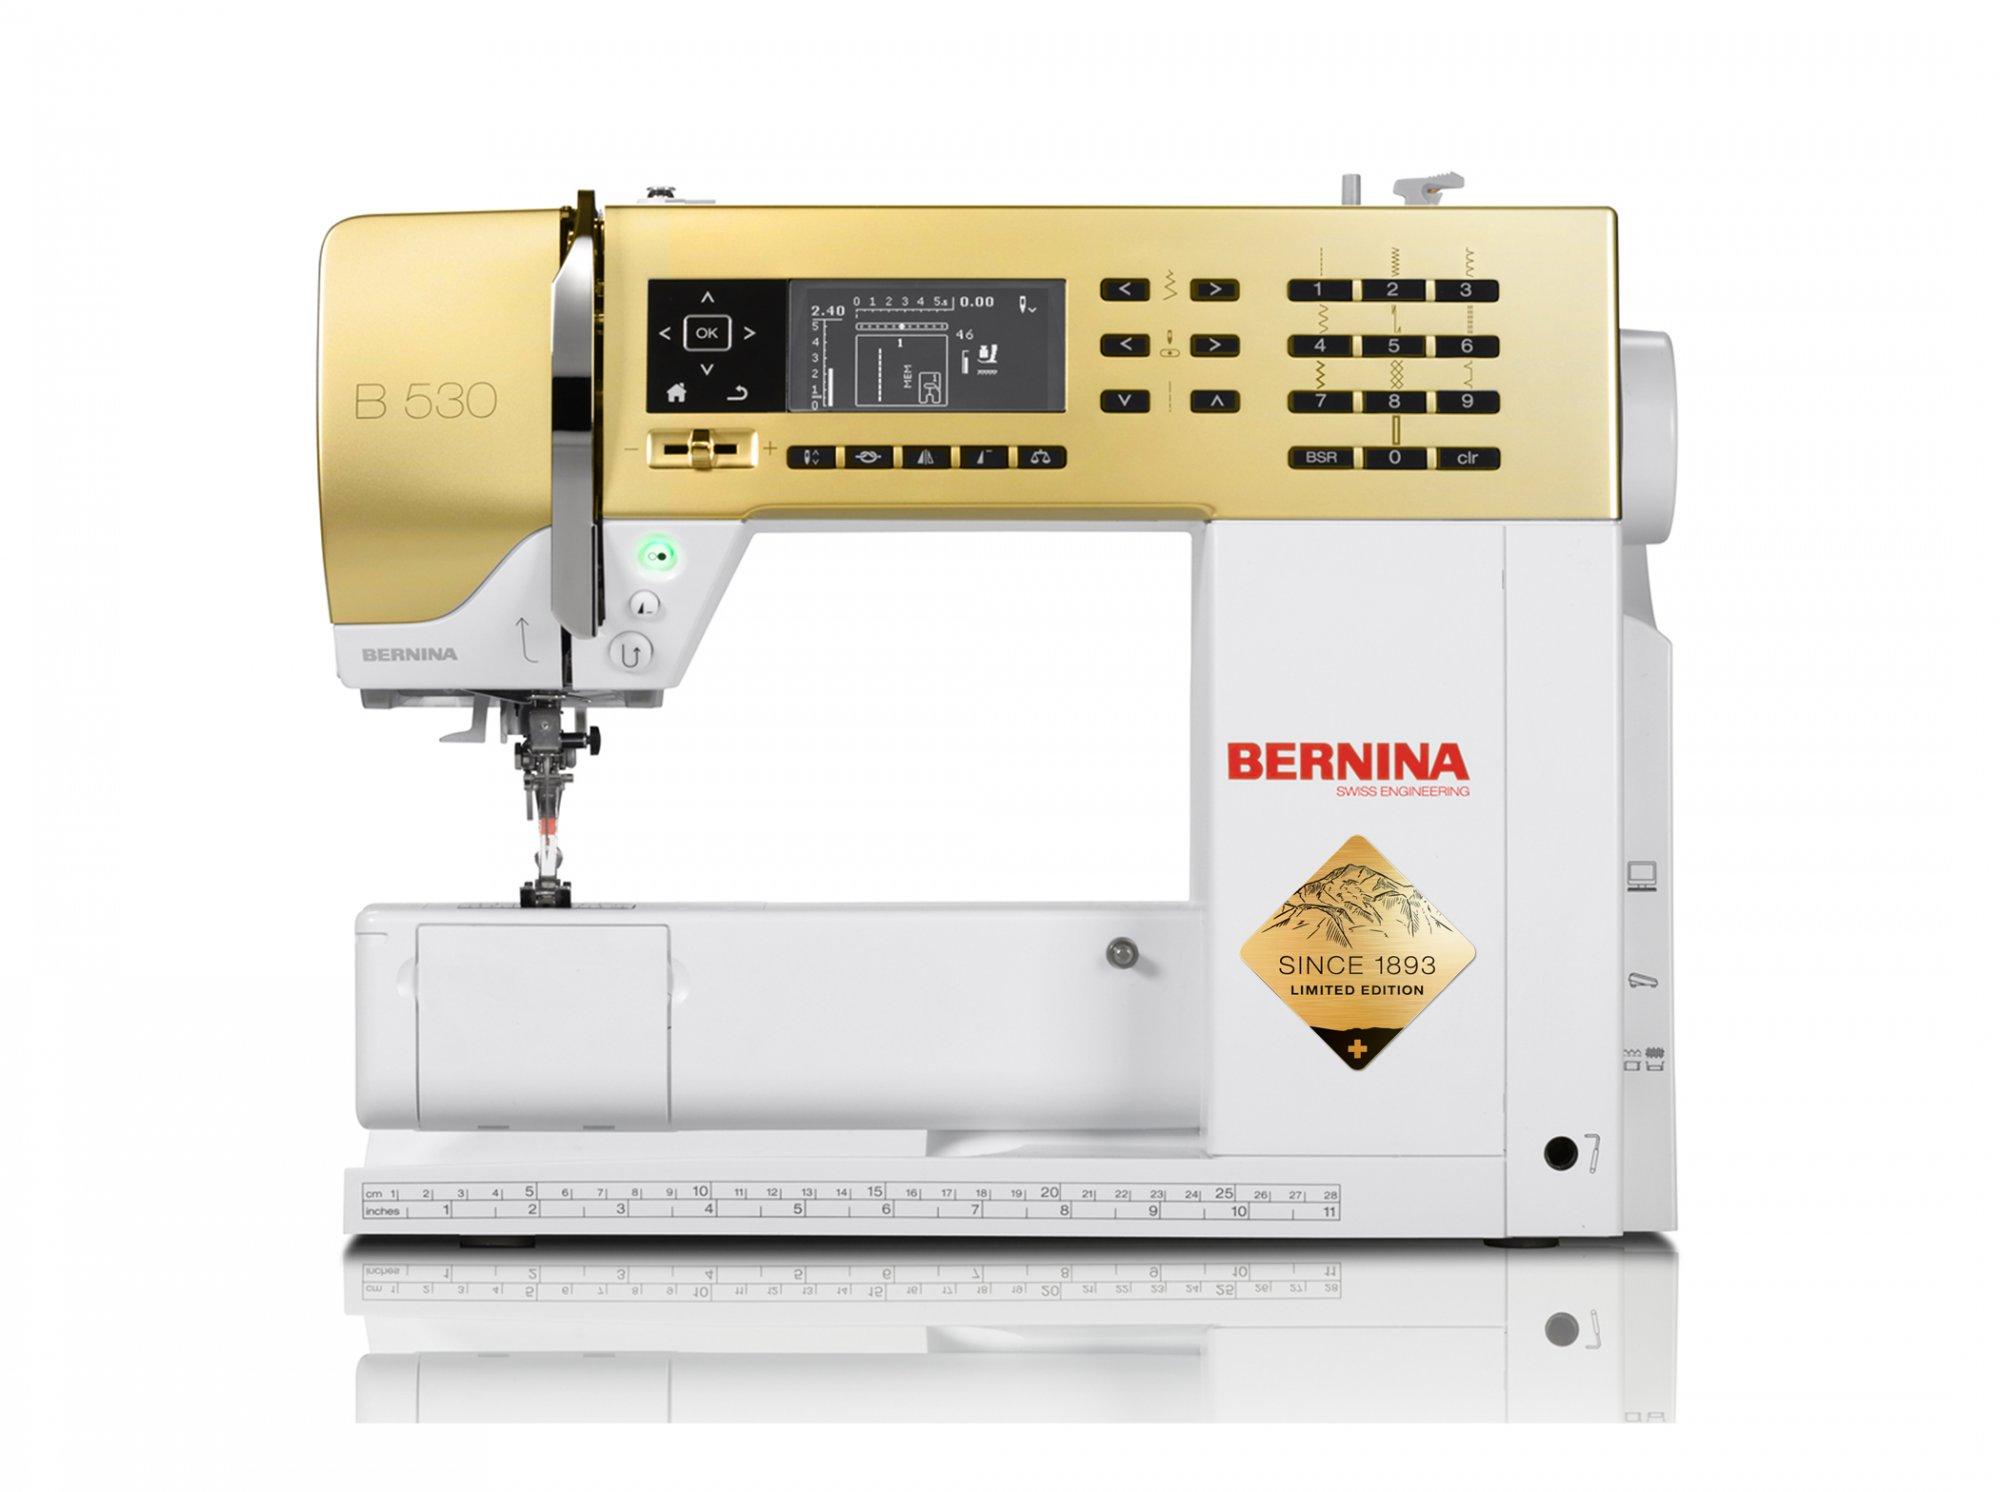 BERNINA GOLD 530 SPECIAL EDITION